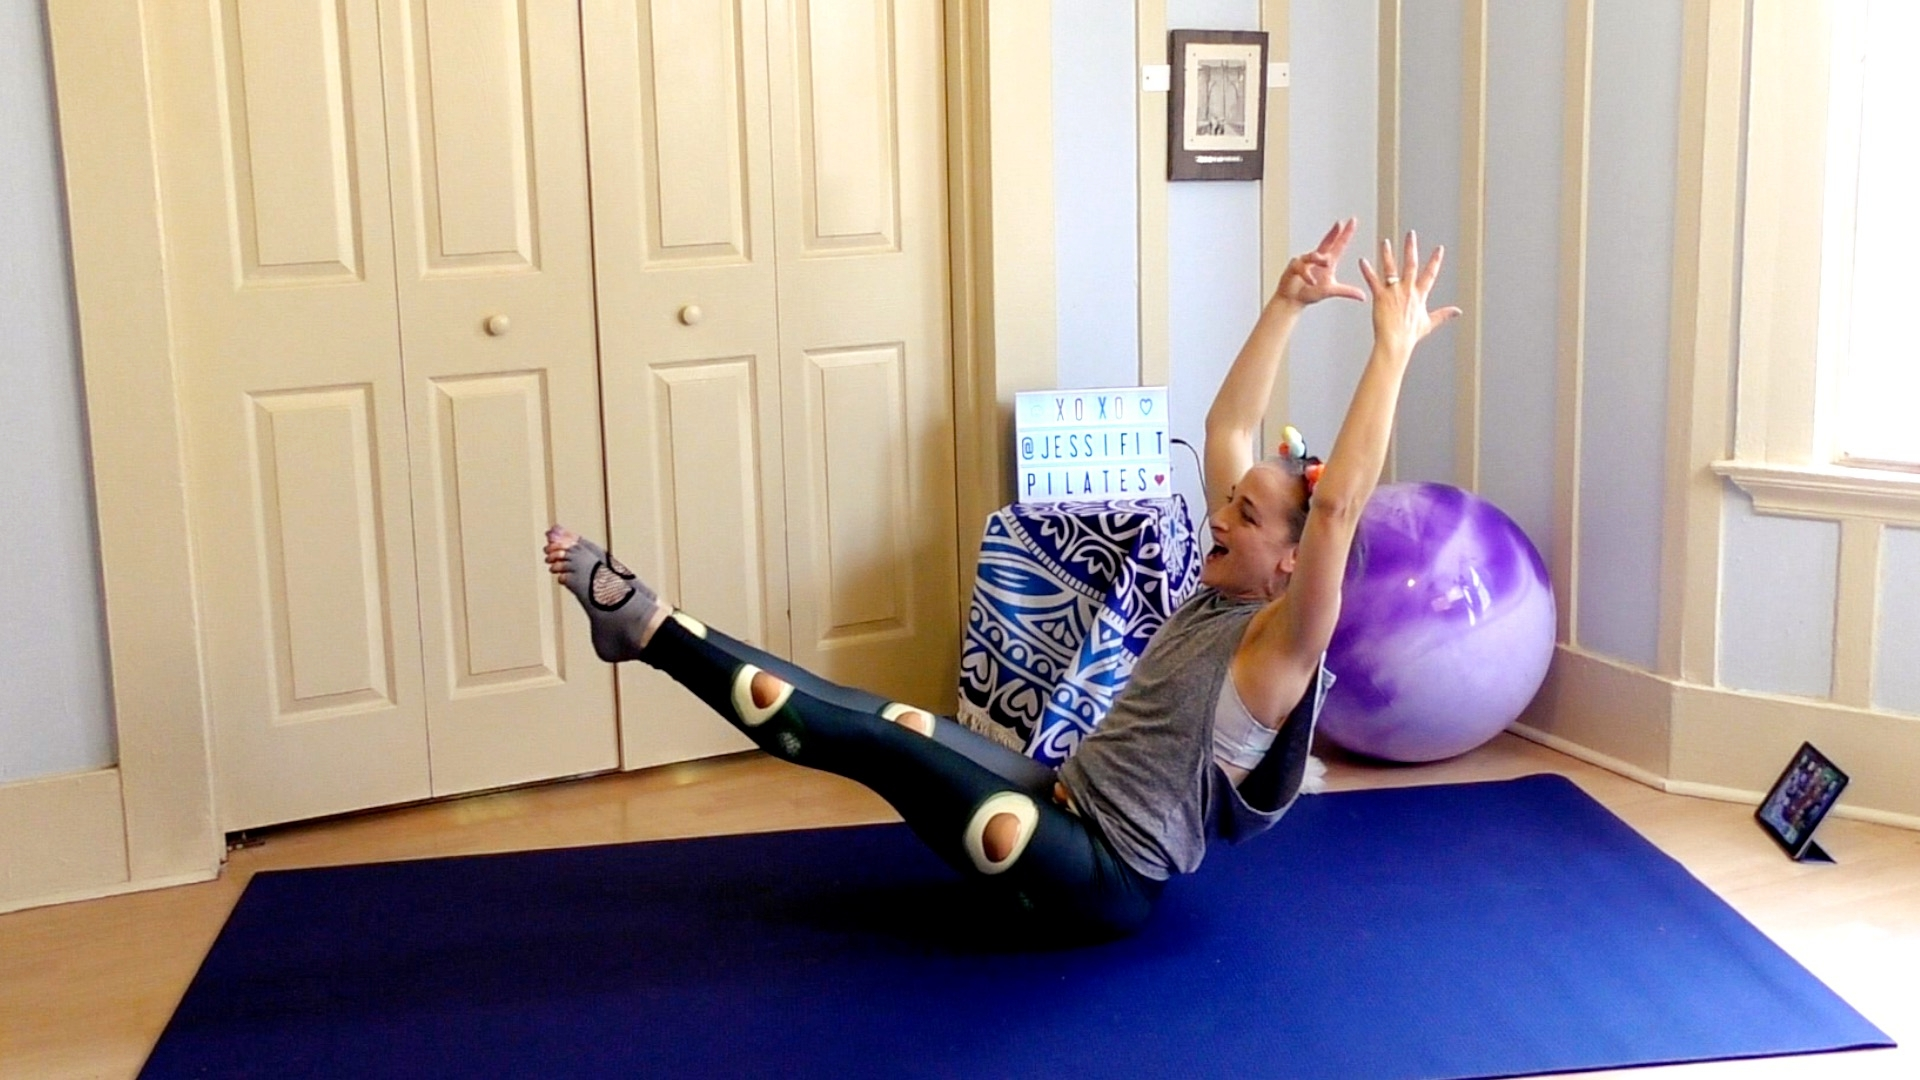 teaser jessi fit pilates top 5 ab exercises